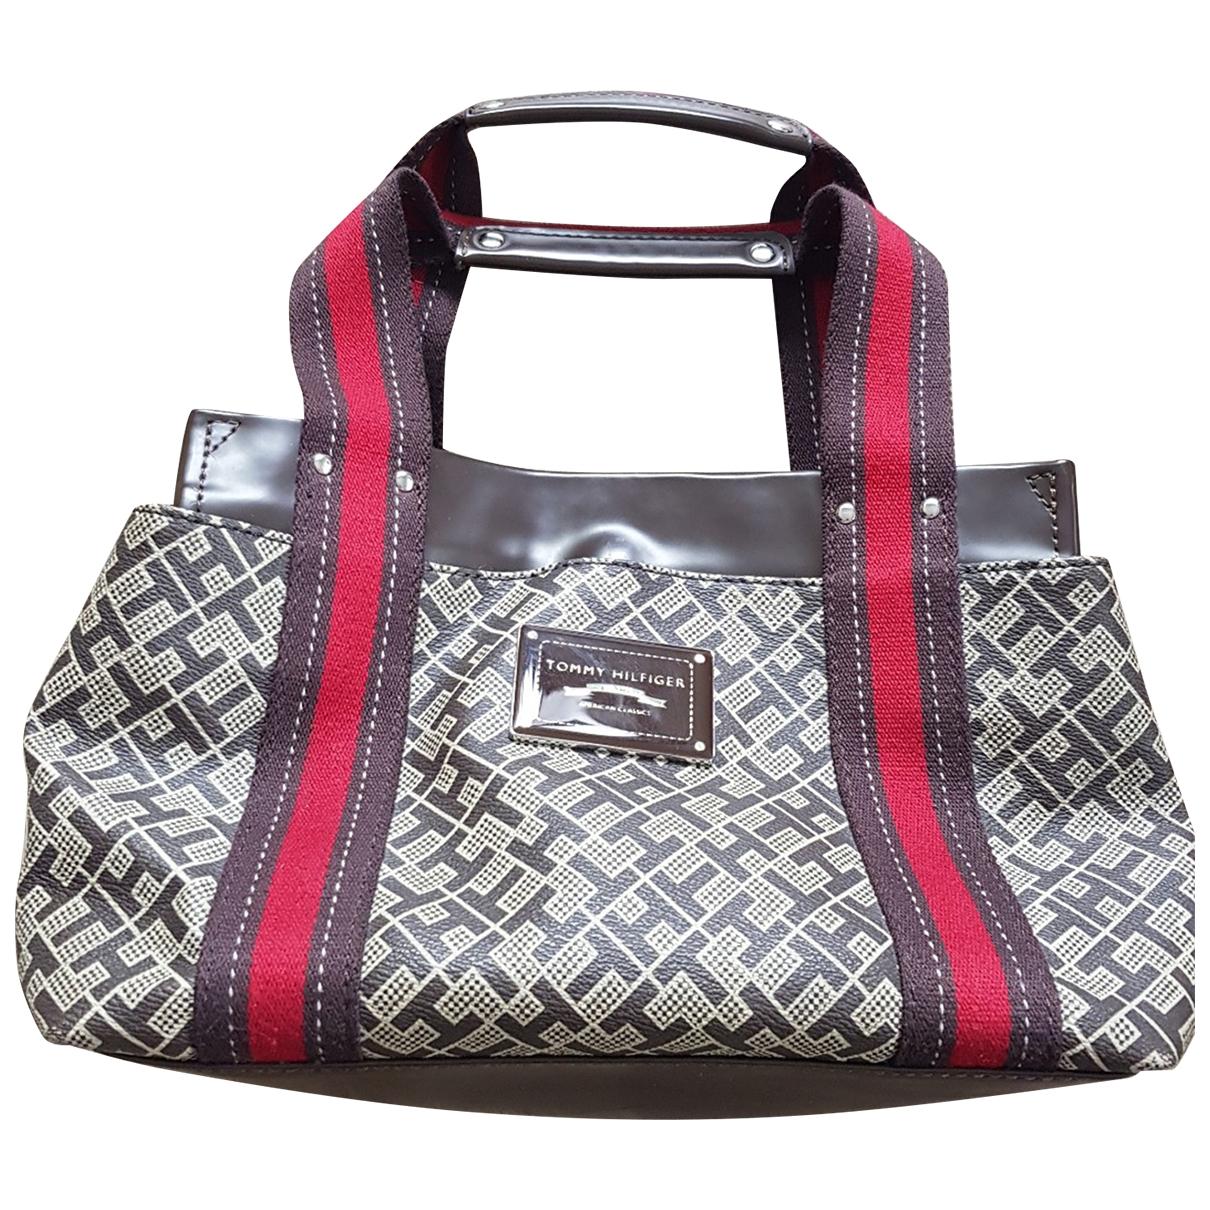 Tommy Hilfiger \N Brown handbag for Women \N